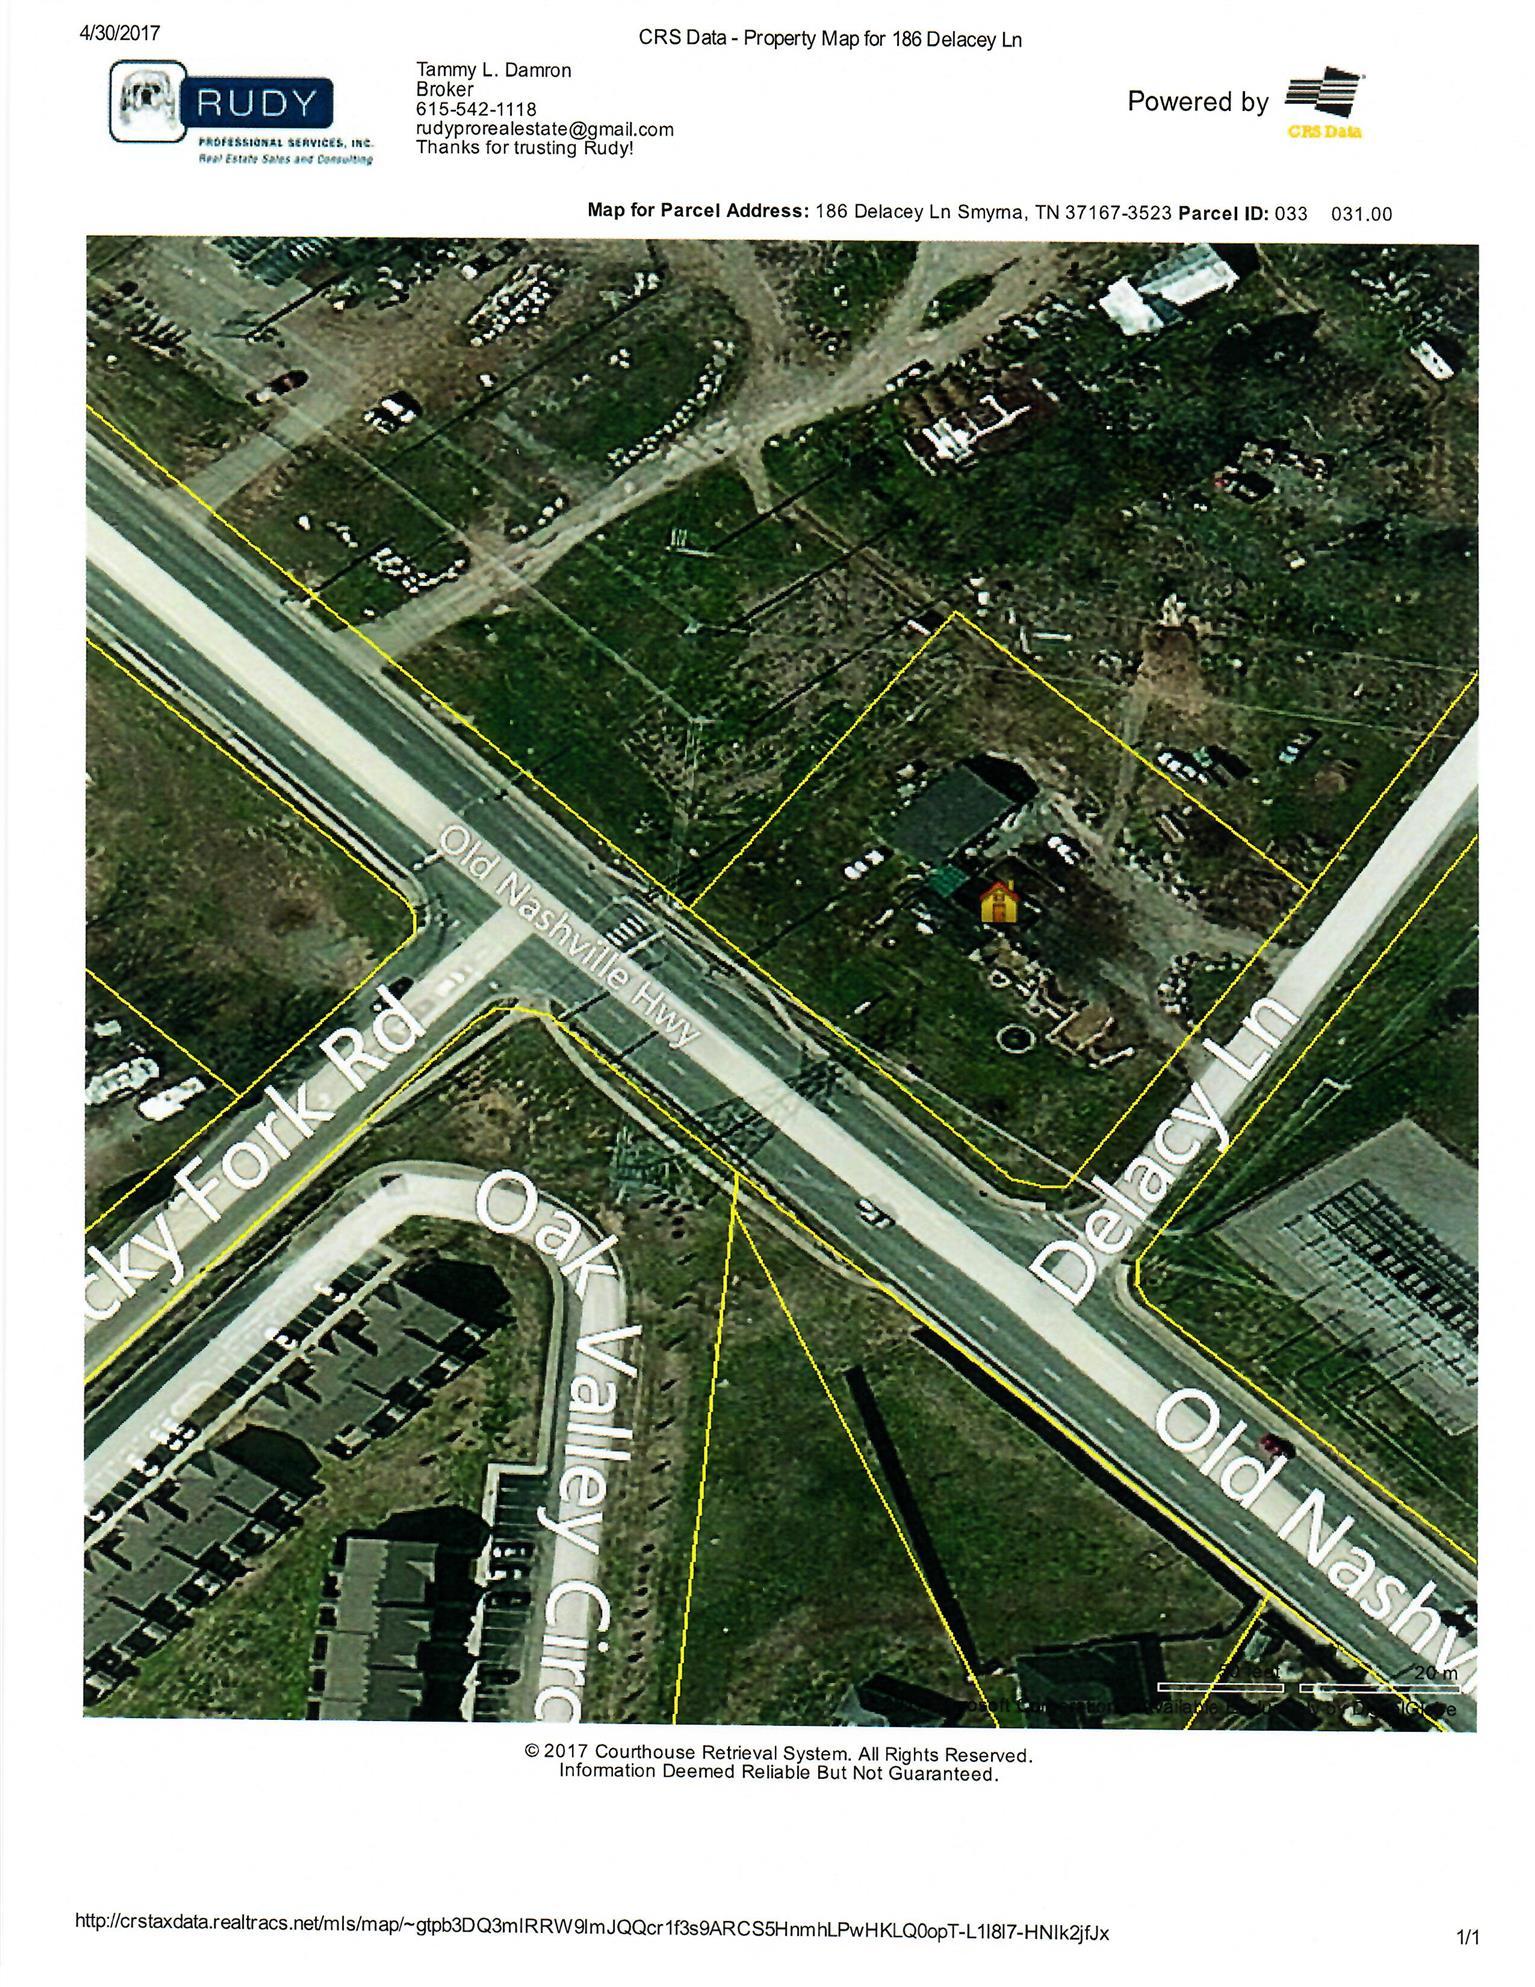 Nashville Tn Traffic Map.186 Delacey Ln